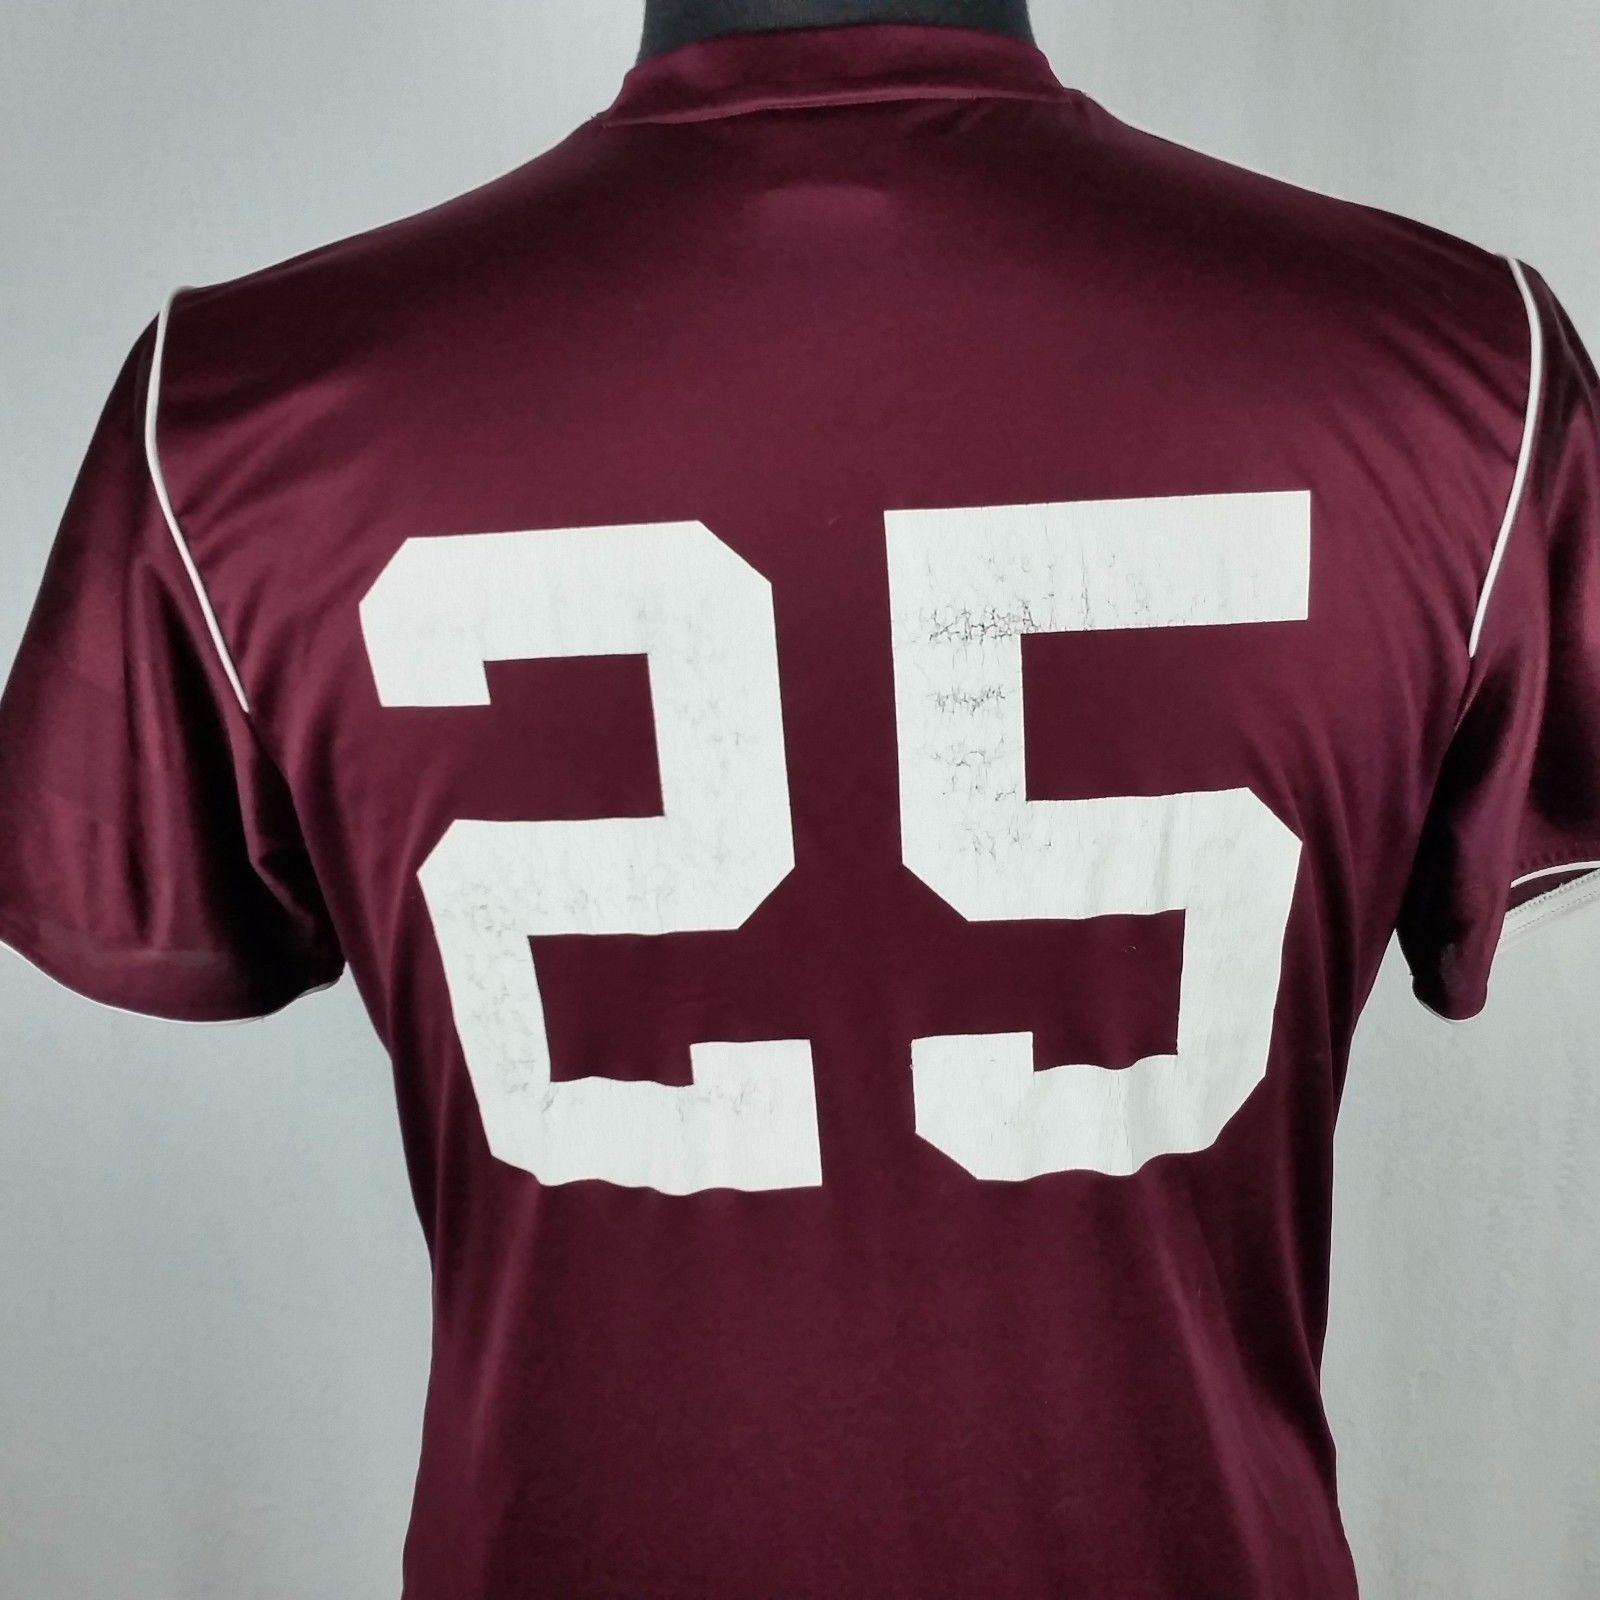 Colorado Rapids Adidas Climalite Mens Med Maroon Burgundy Soccer Jersey